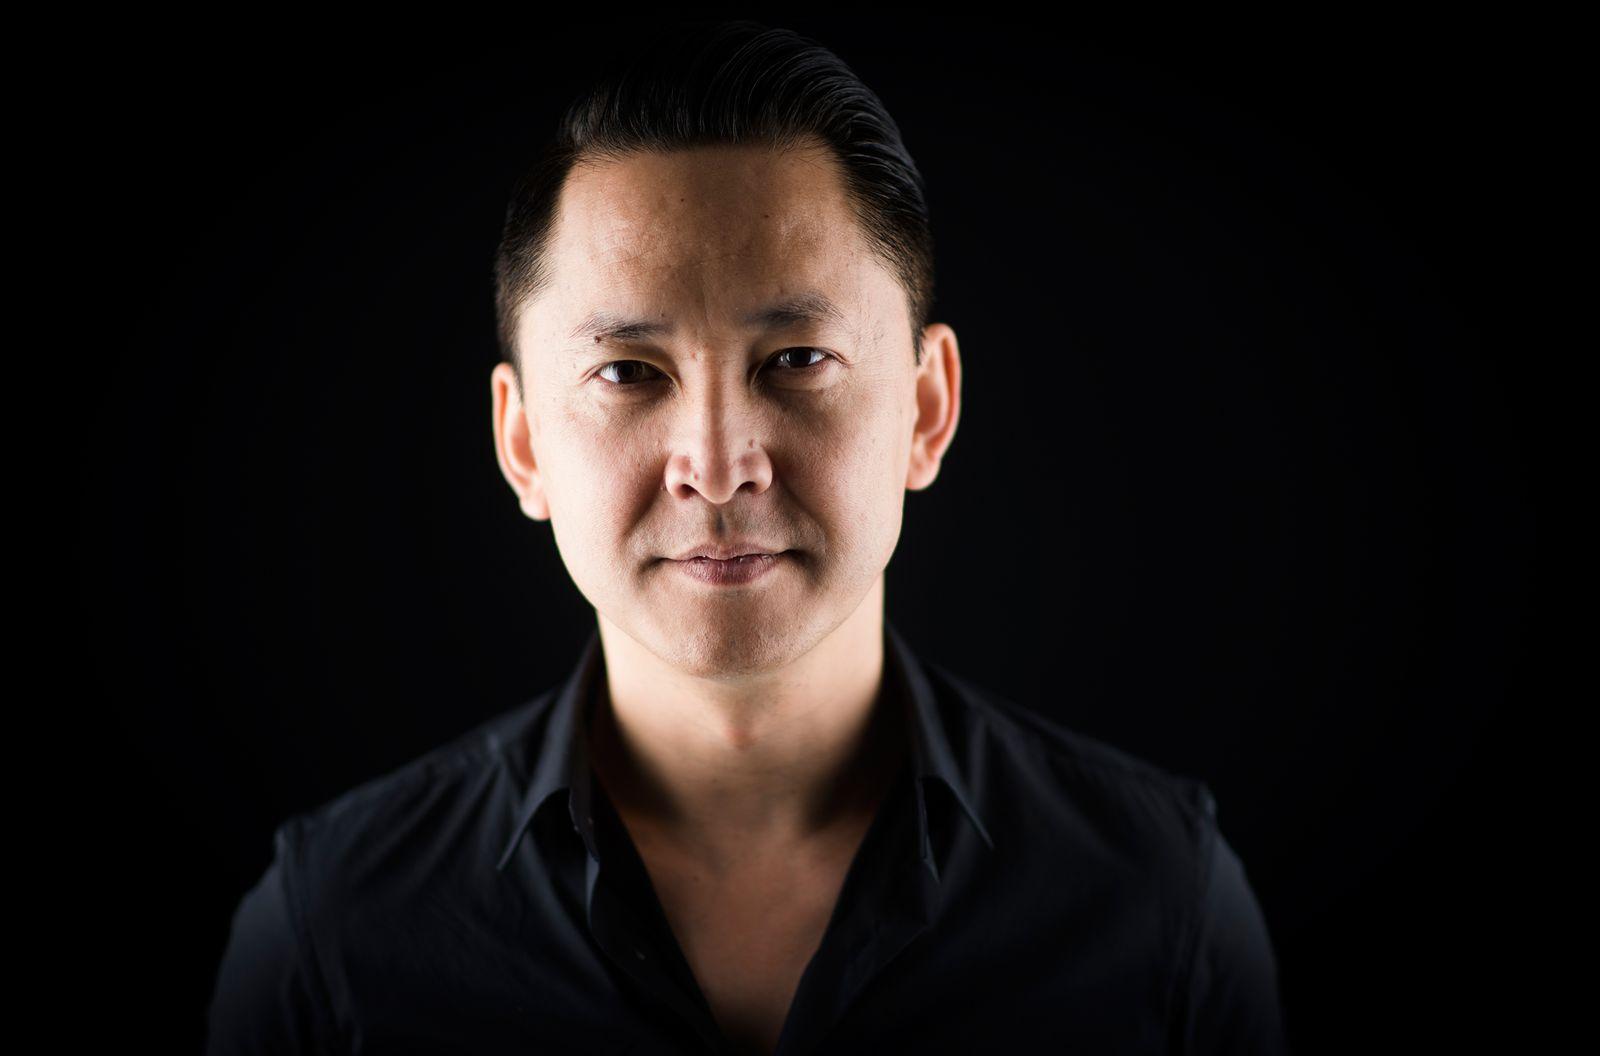 Buch/ Viet Thanh Nguyen: Der Sympathisant